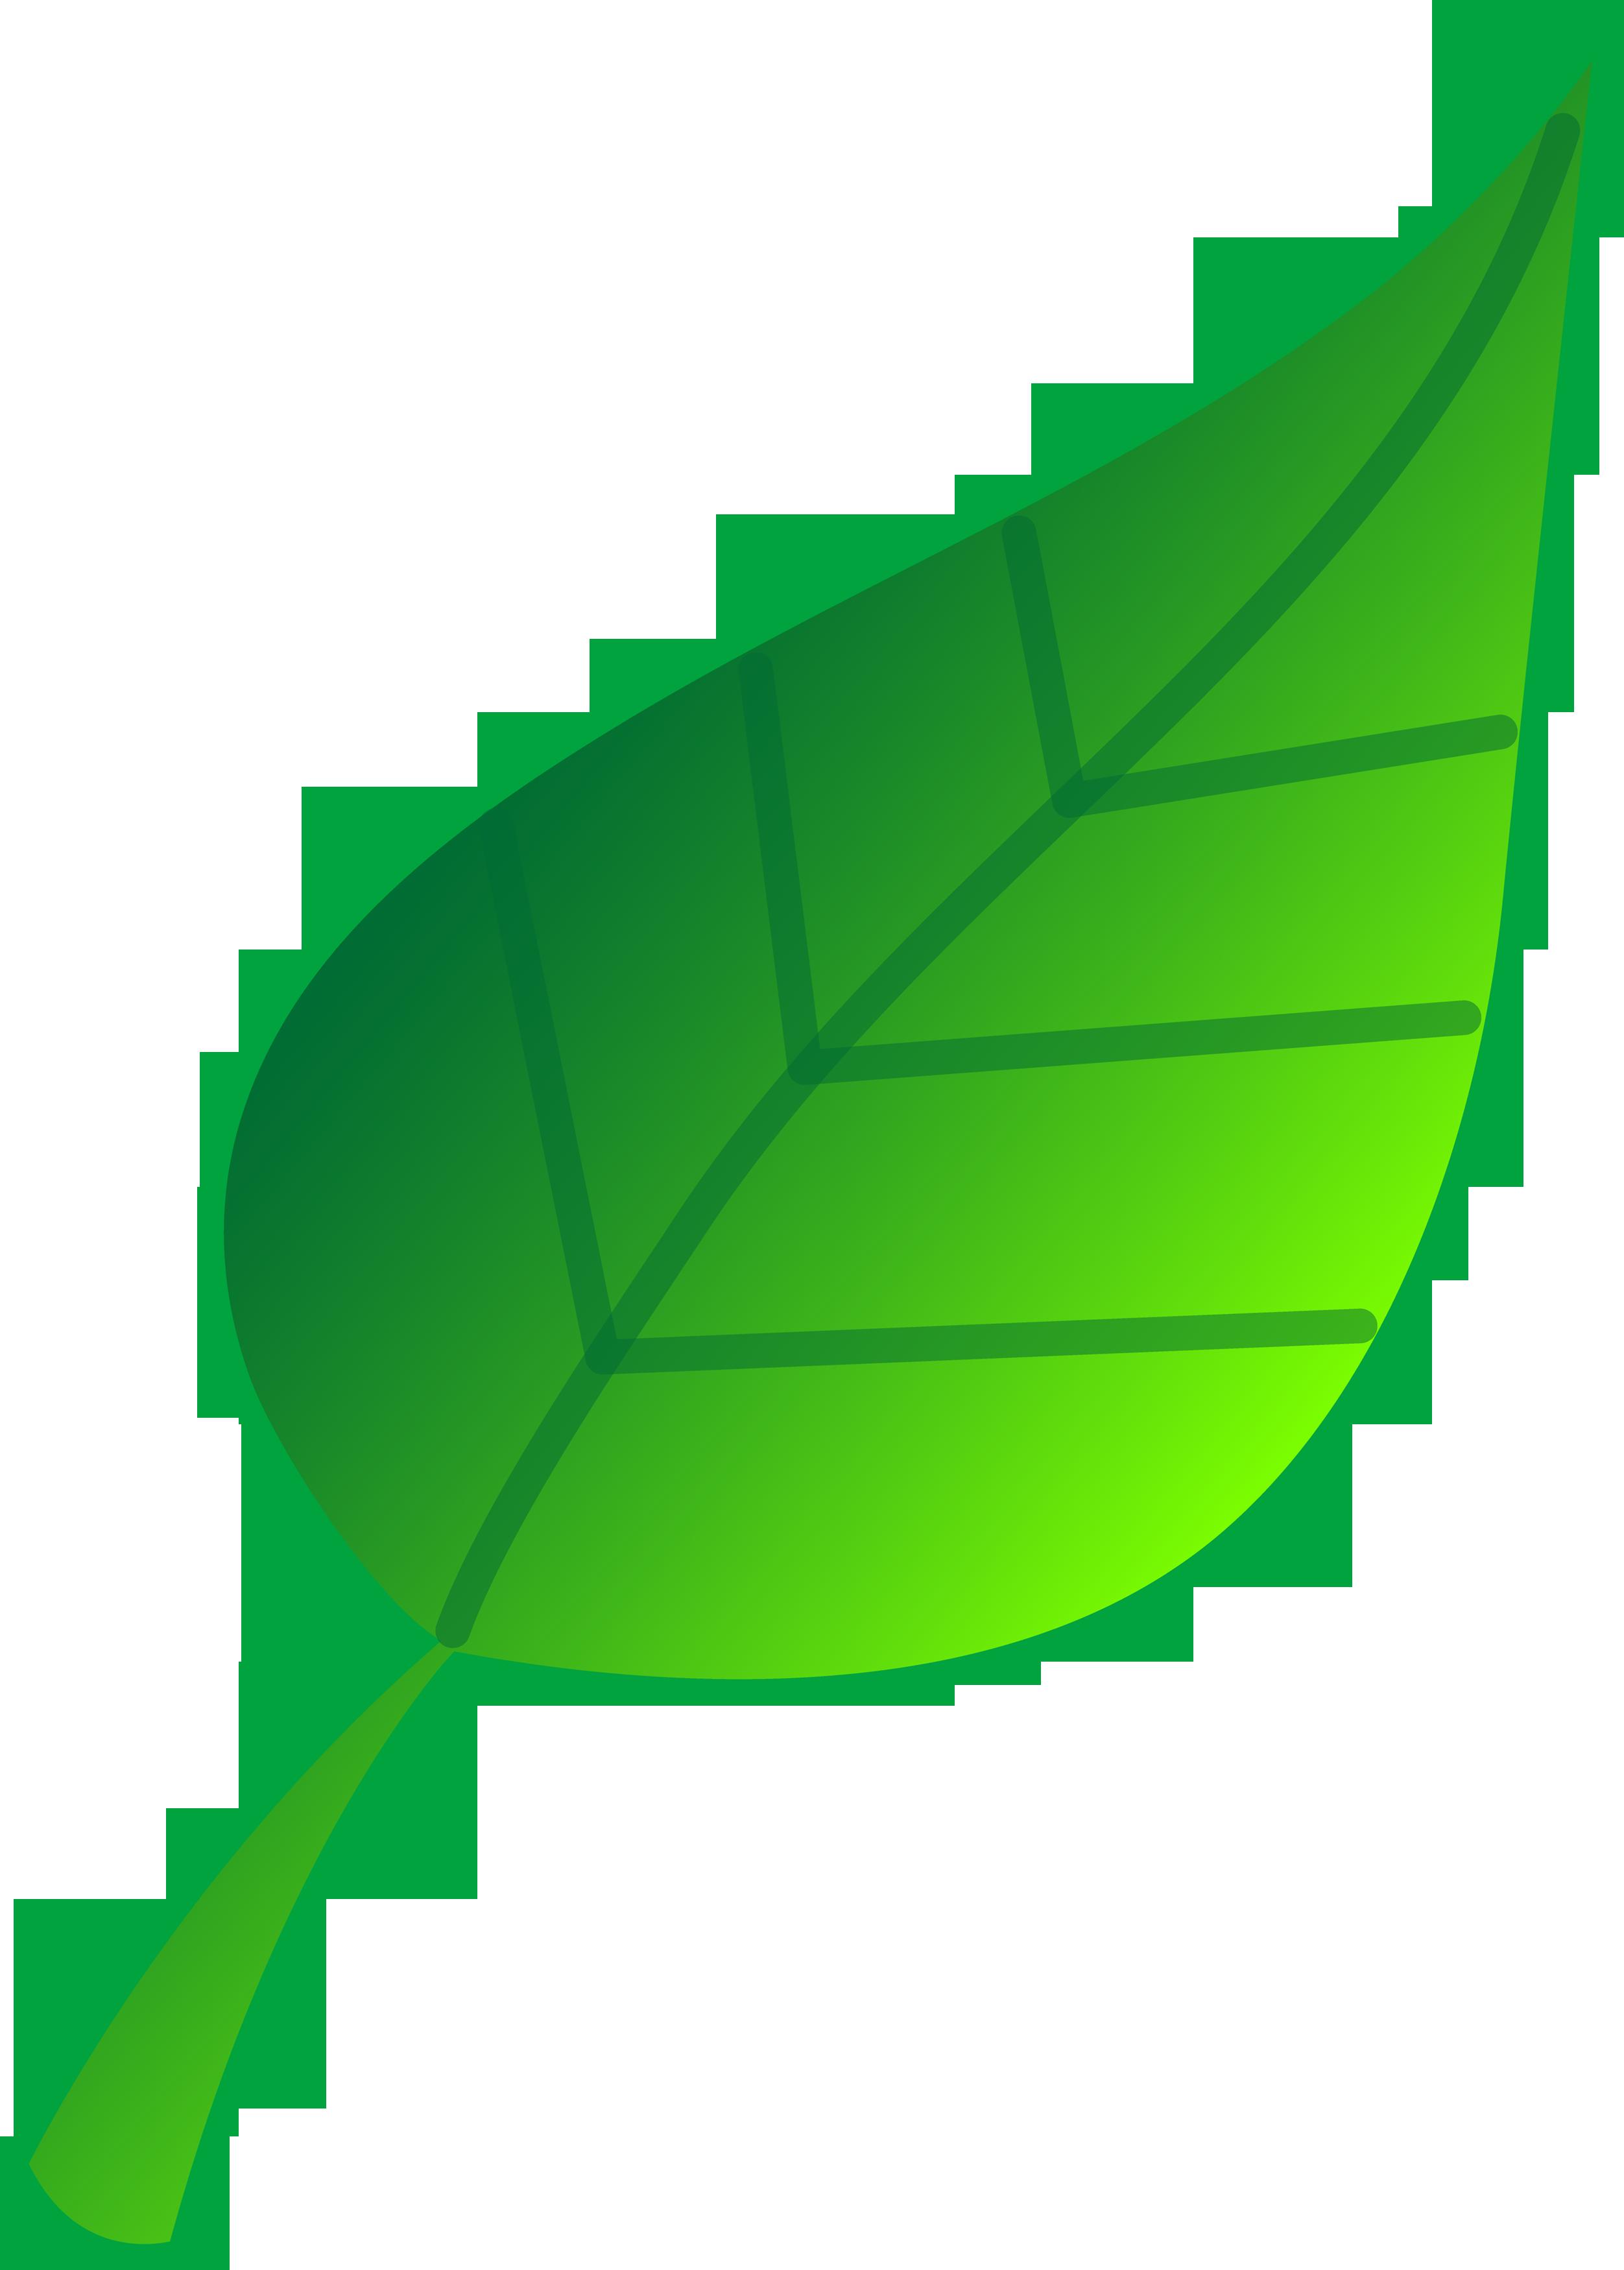 Free leaf images clipart. Leaves clip art png